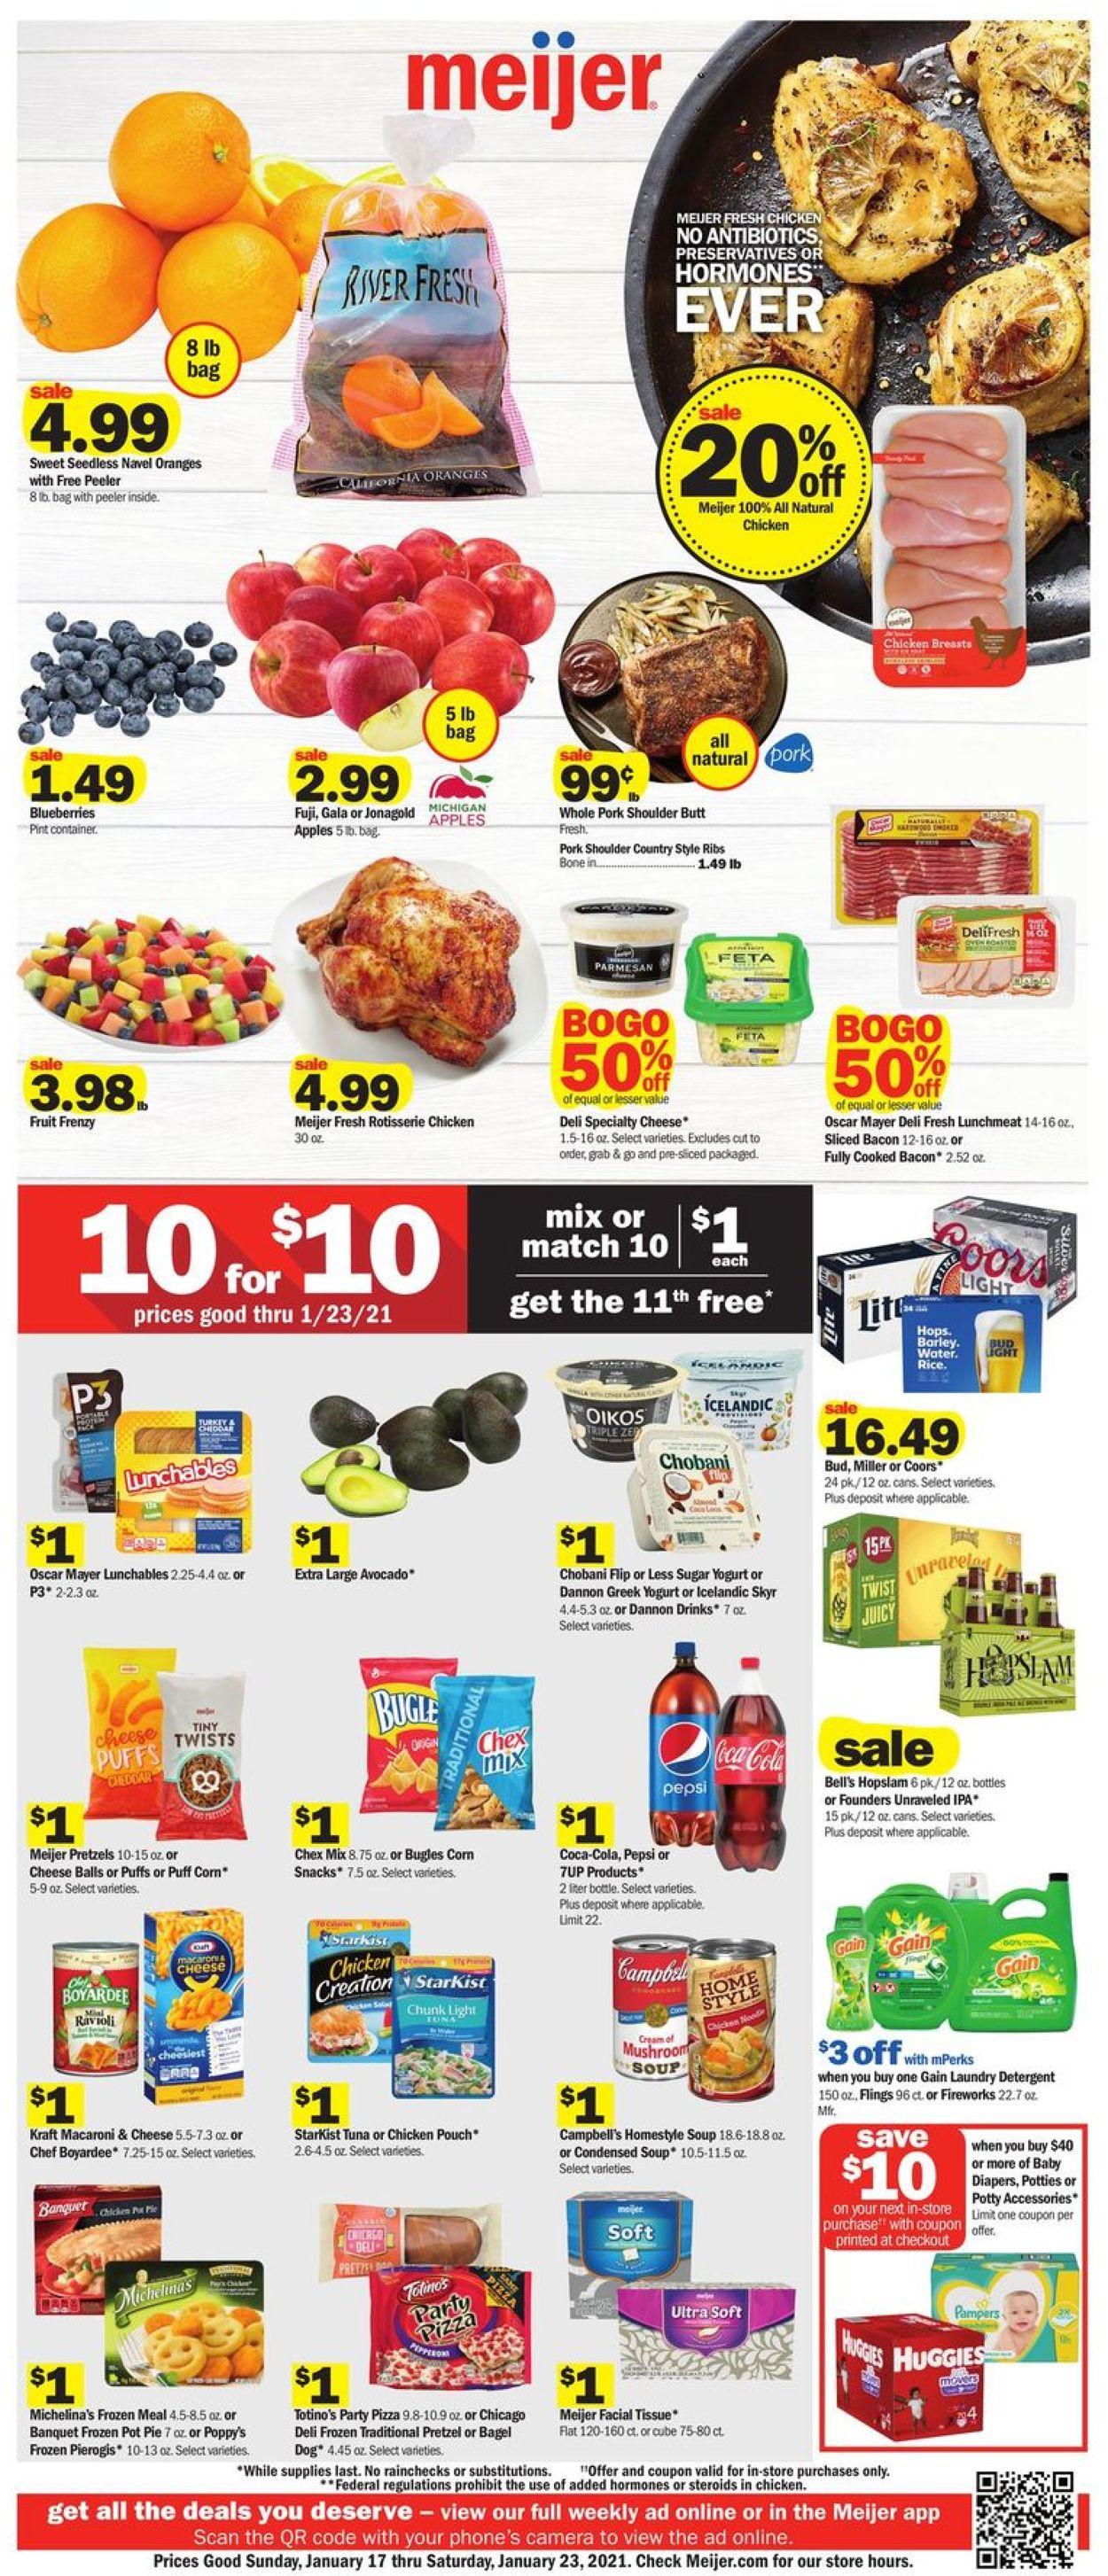 Meijer weekly-ad